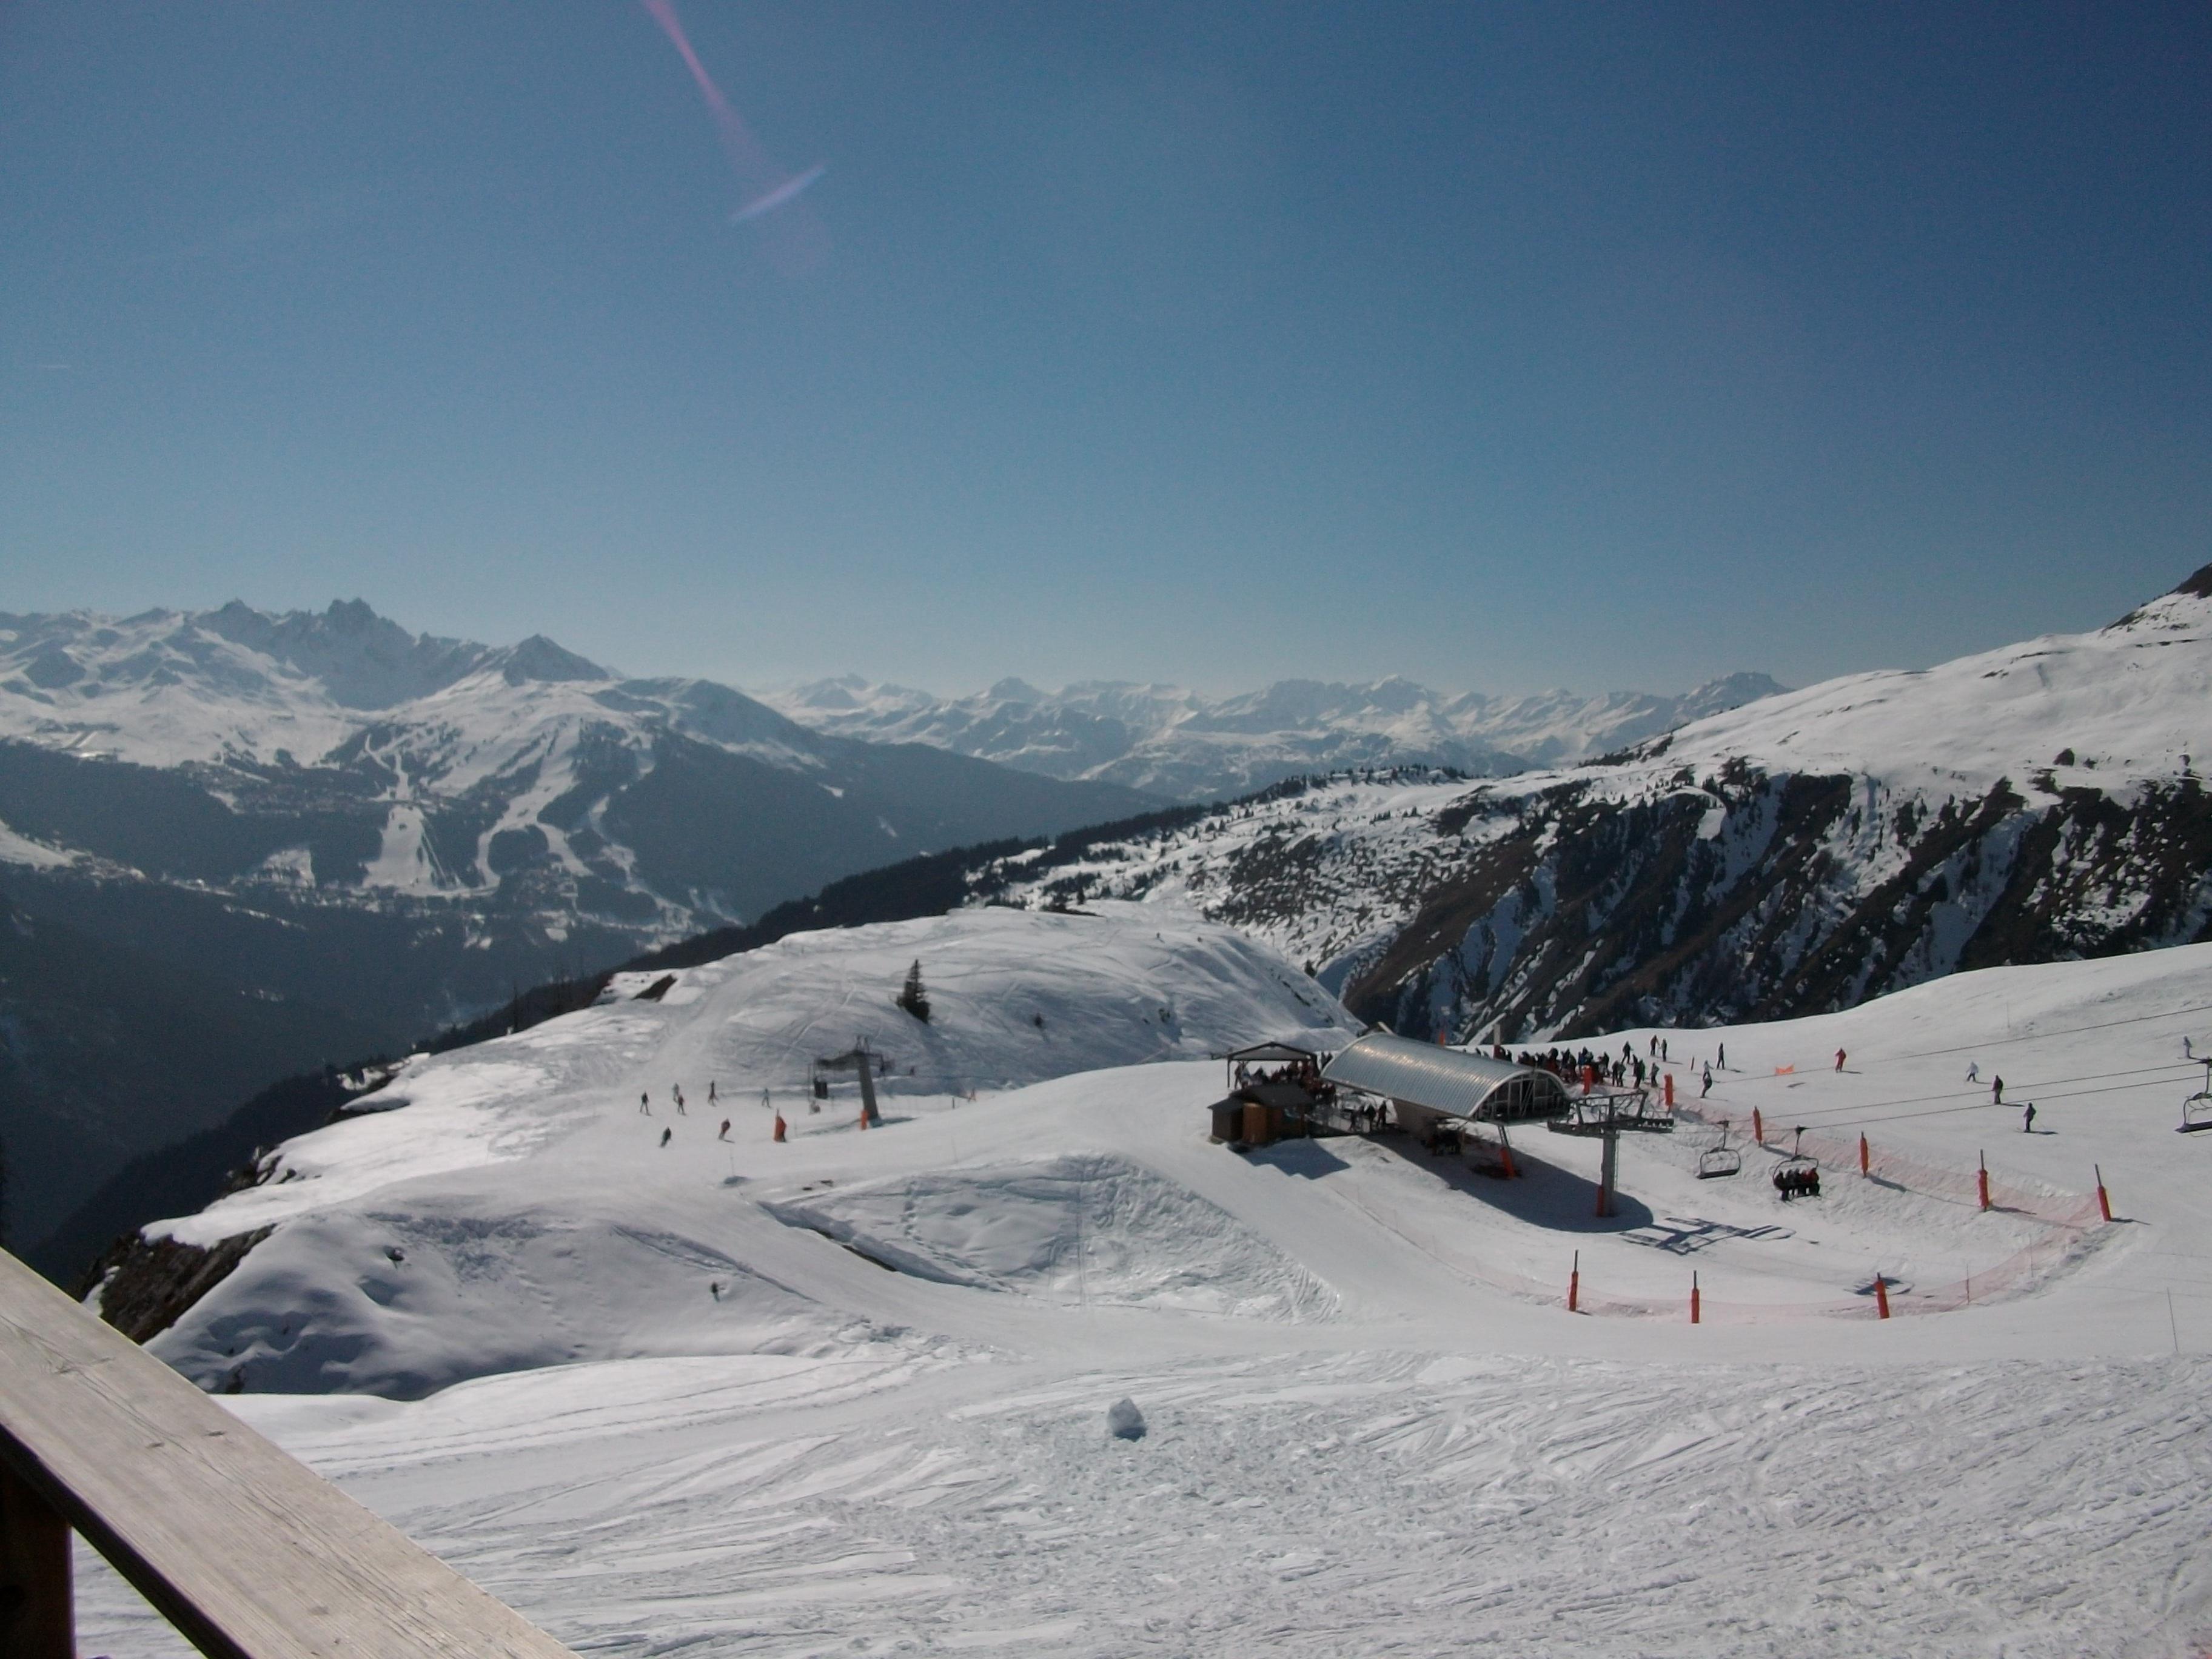 snowboard4life